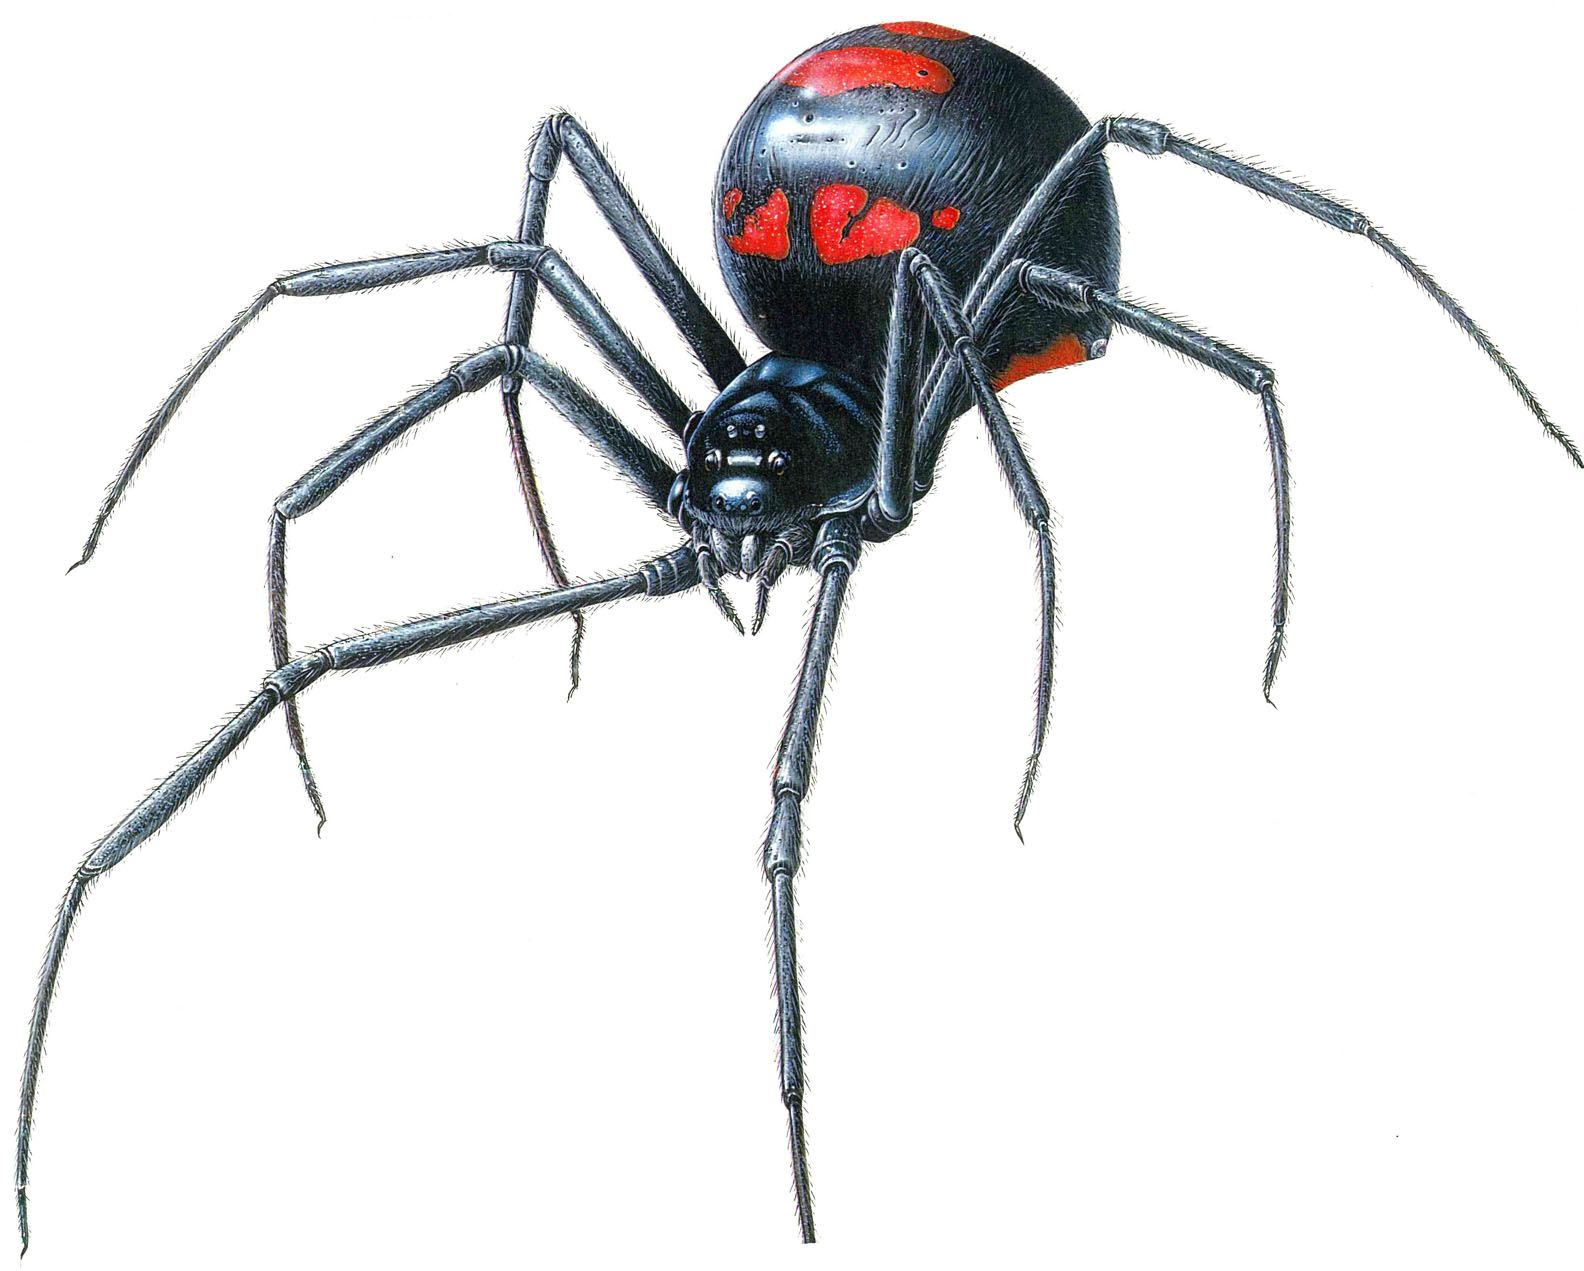 Black Widow Spider Web Black Widow Spider Web Latrodectus